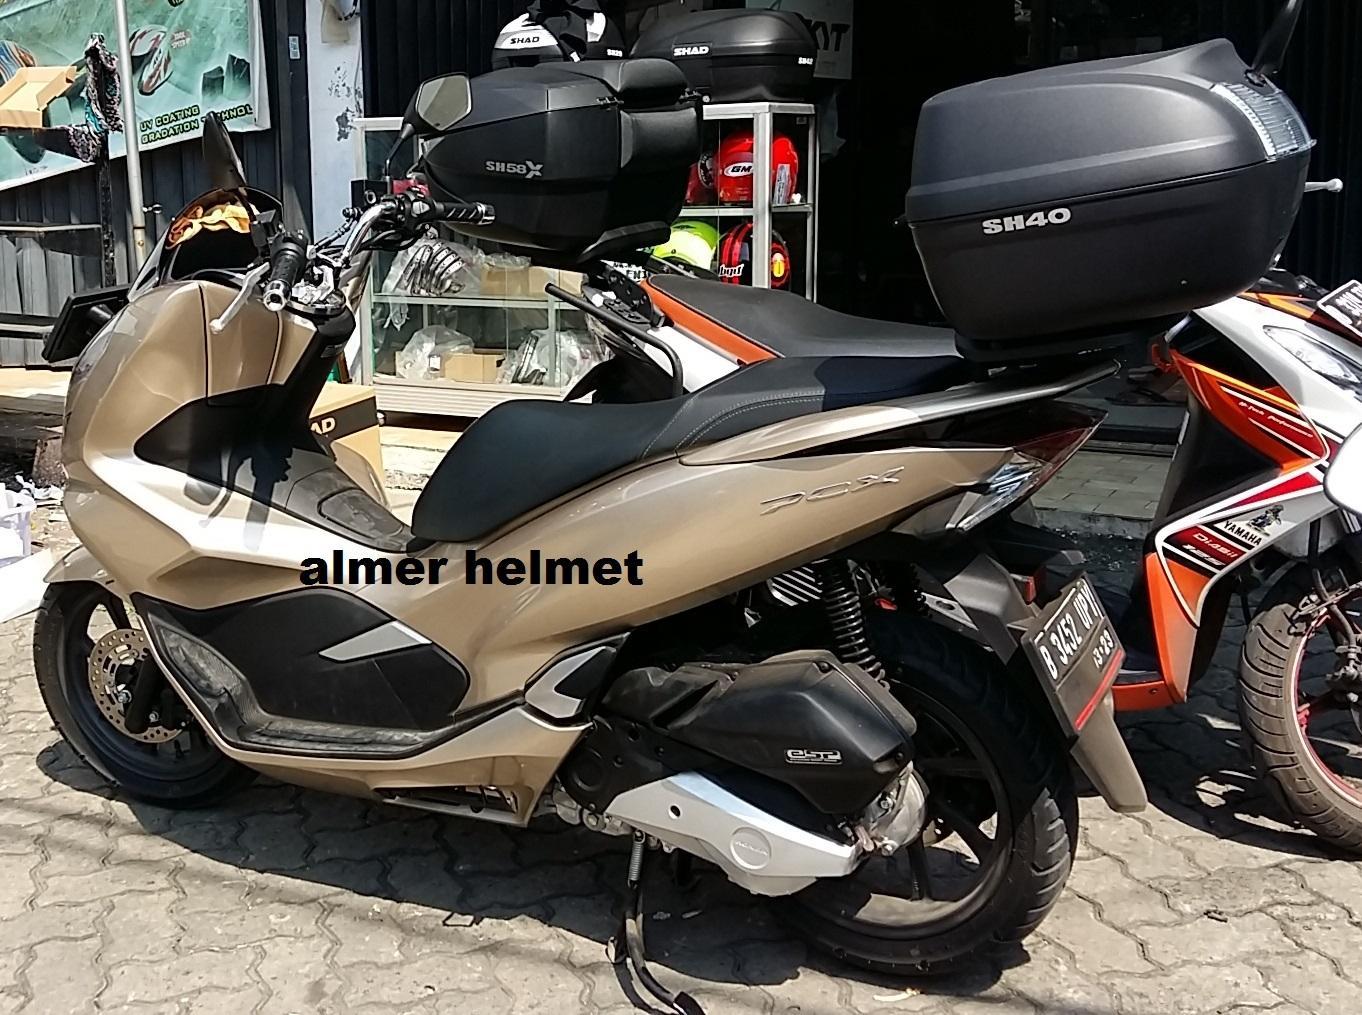 Cek Harga Baru Shad Sh 40 Paket Box Motor Honda Pcx Terkini Situs